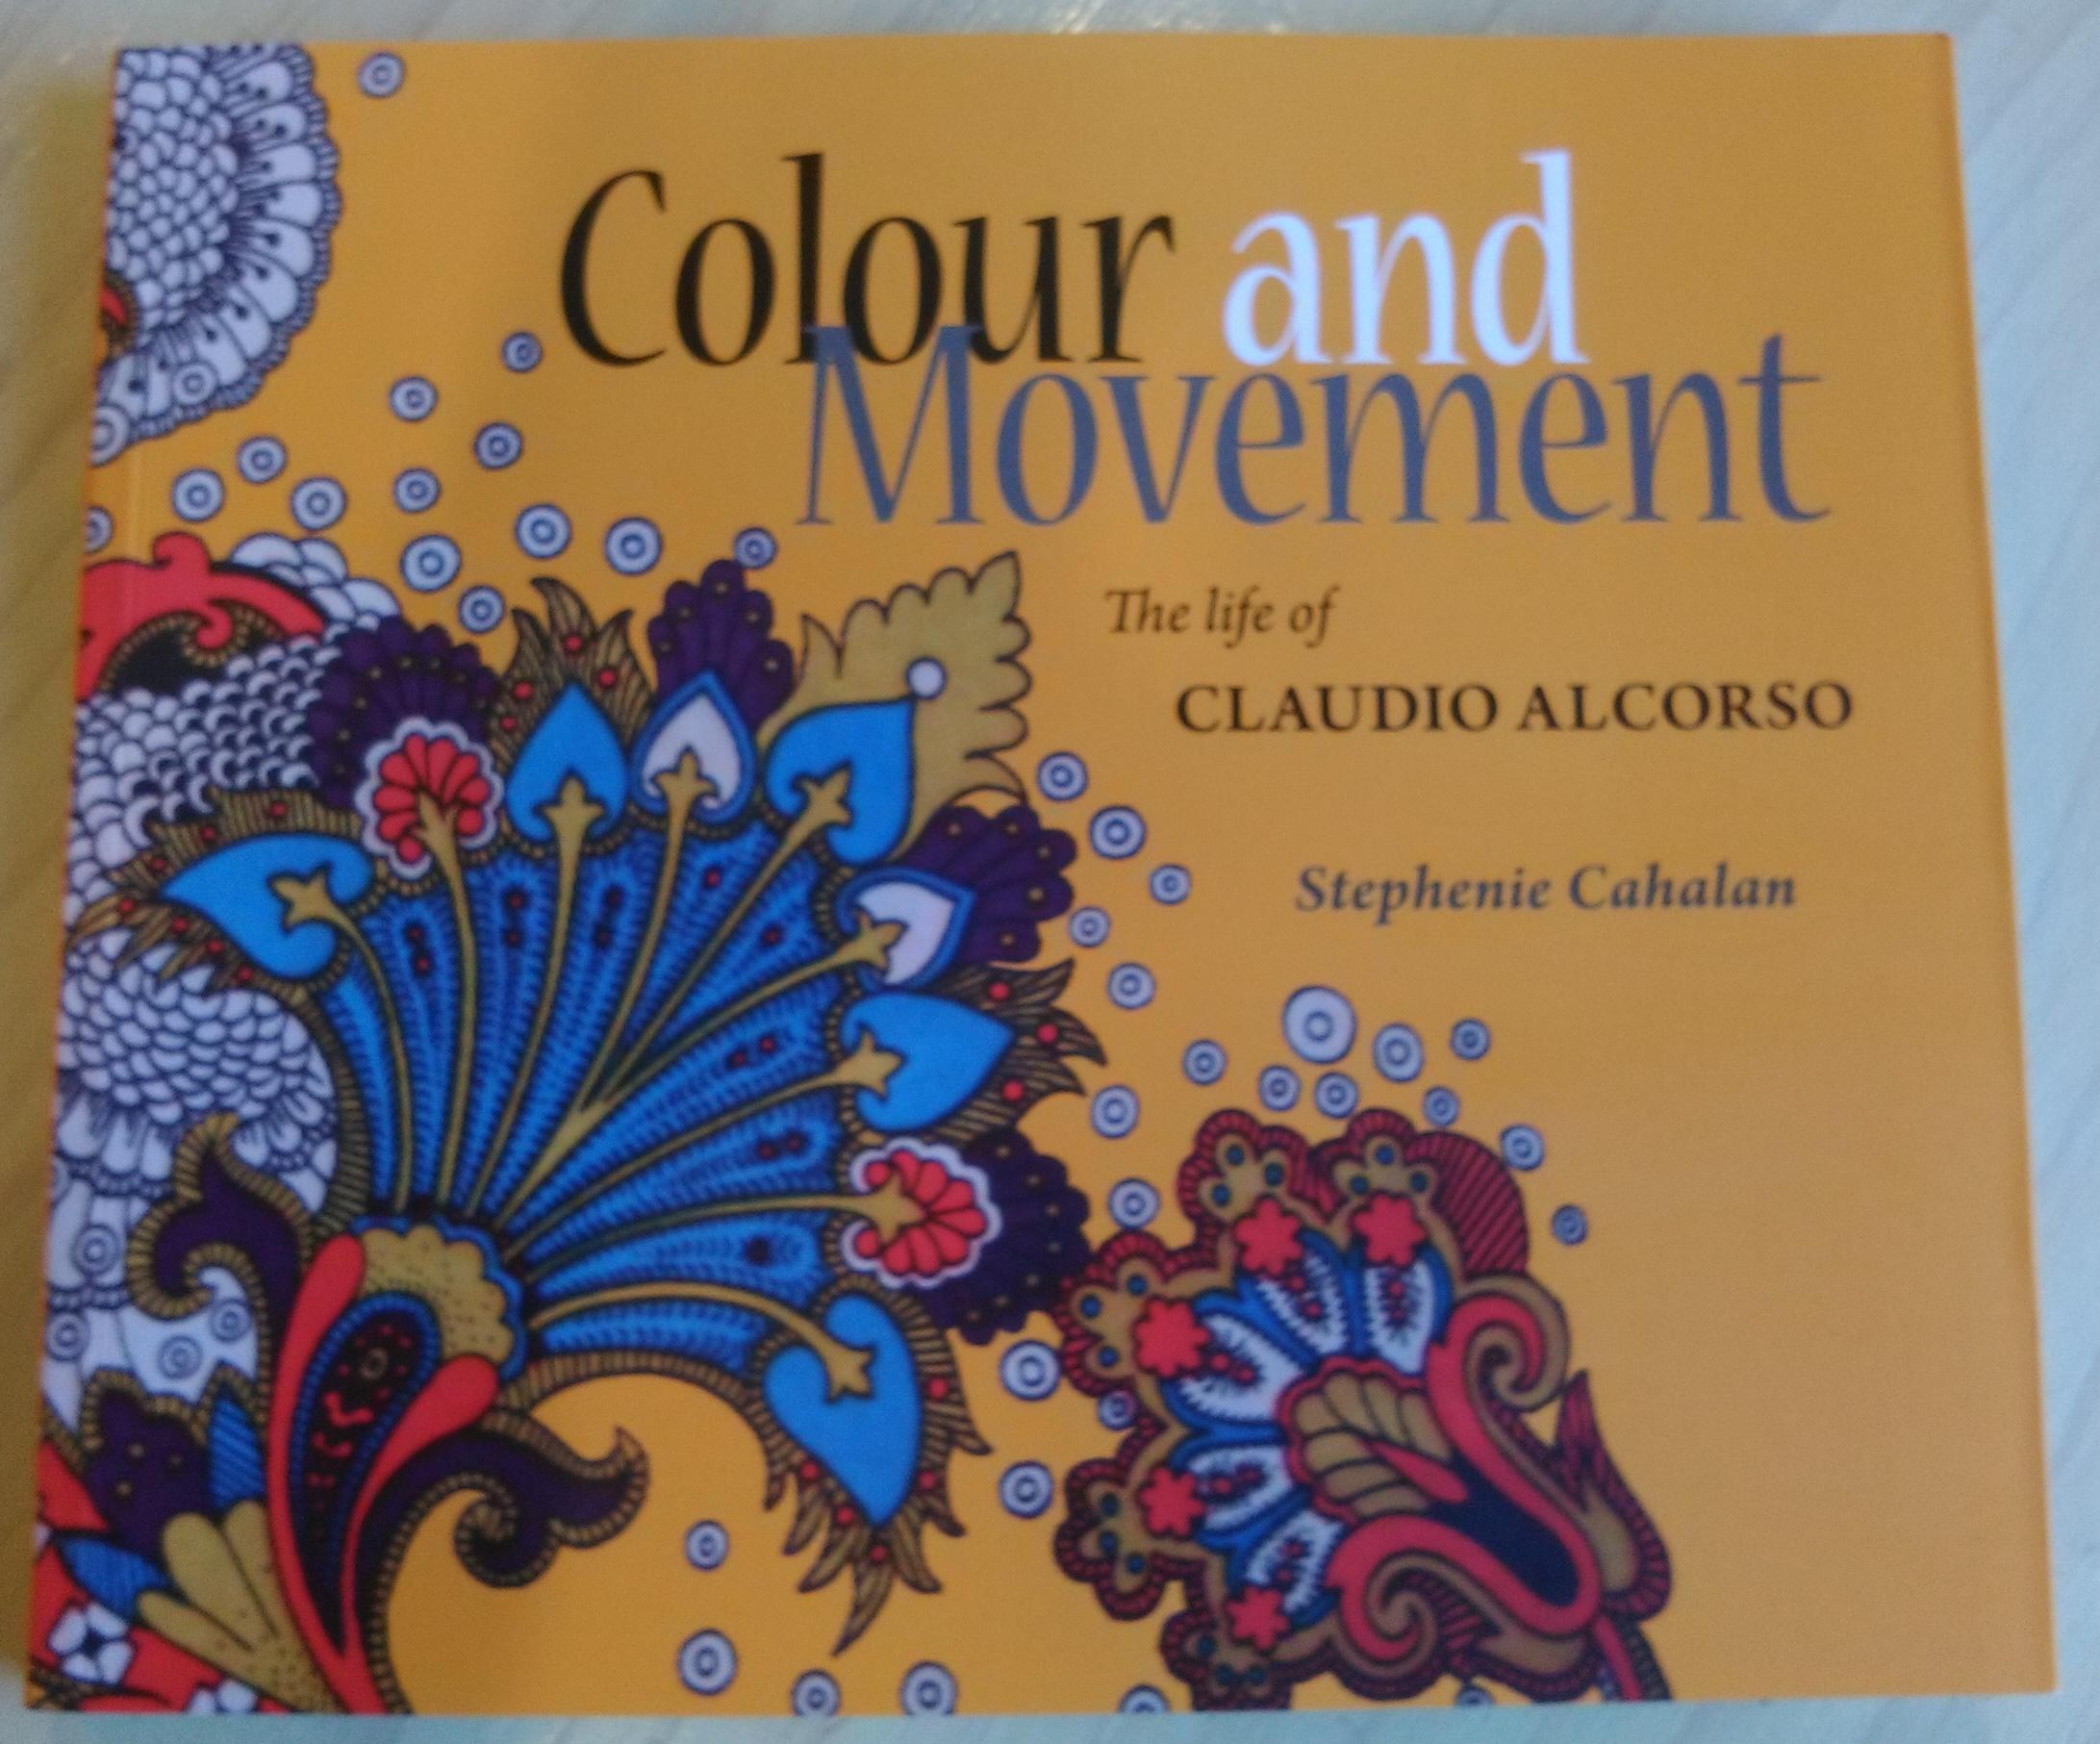 Colour and Movement - the life of Claudio Alcorso